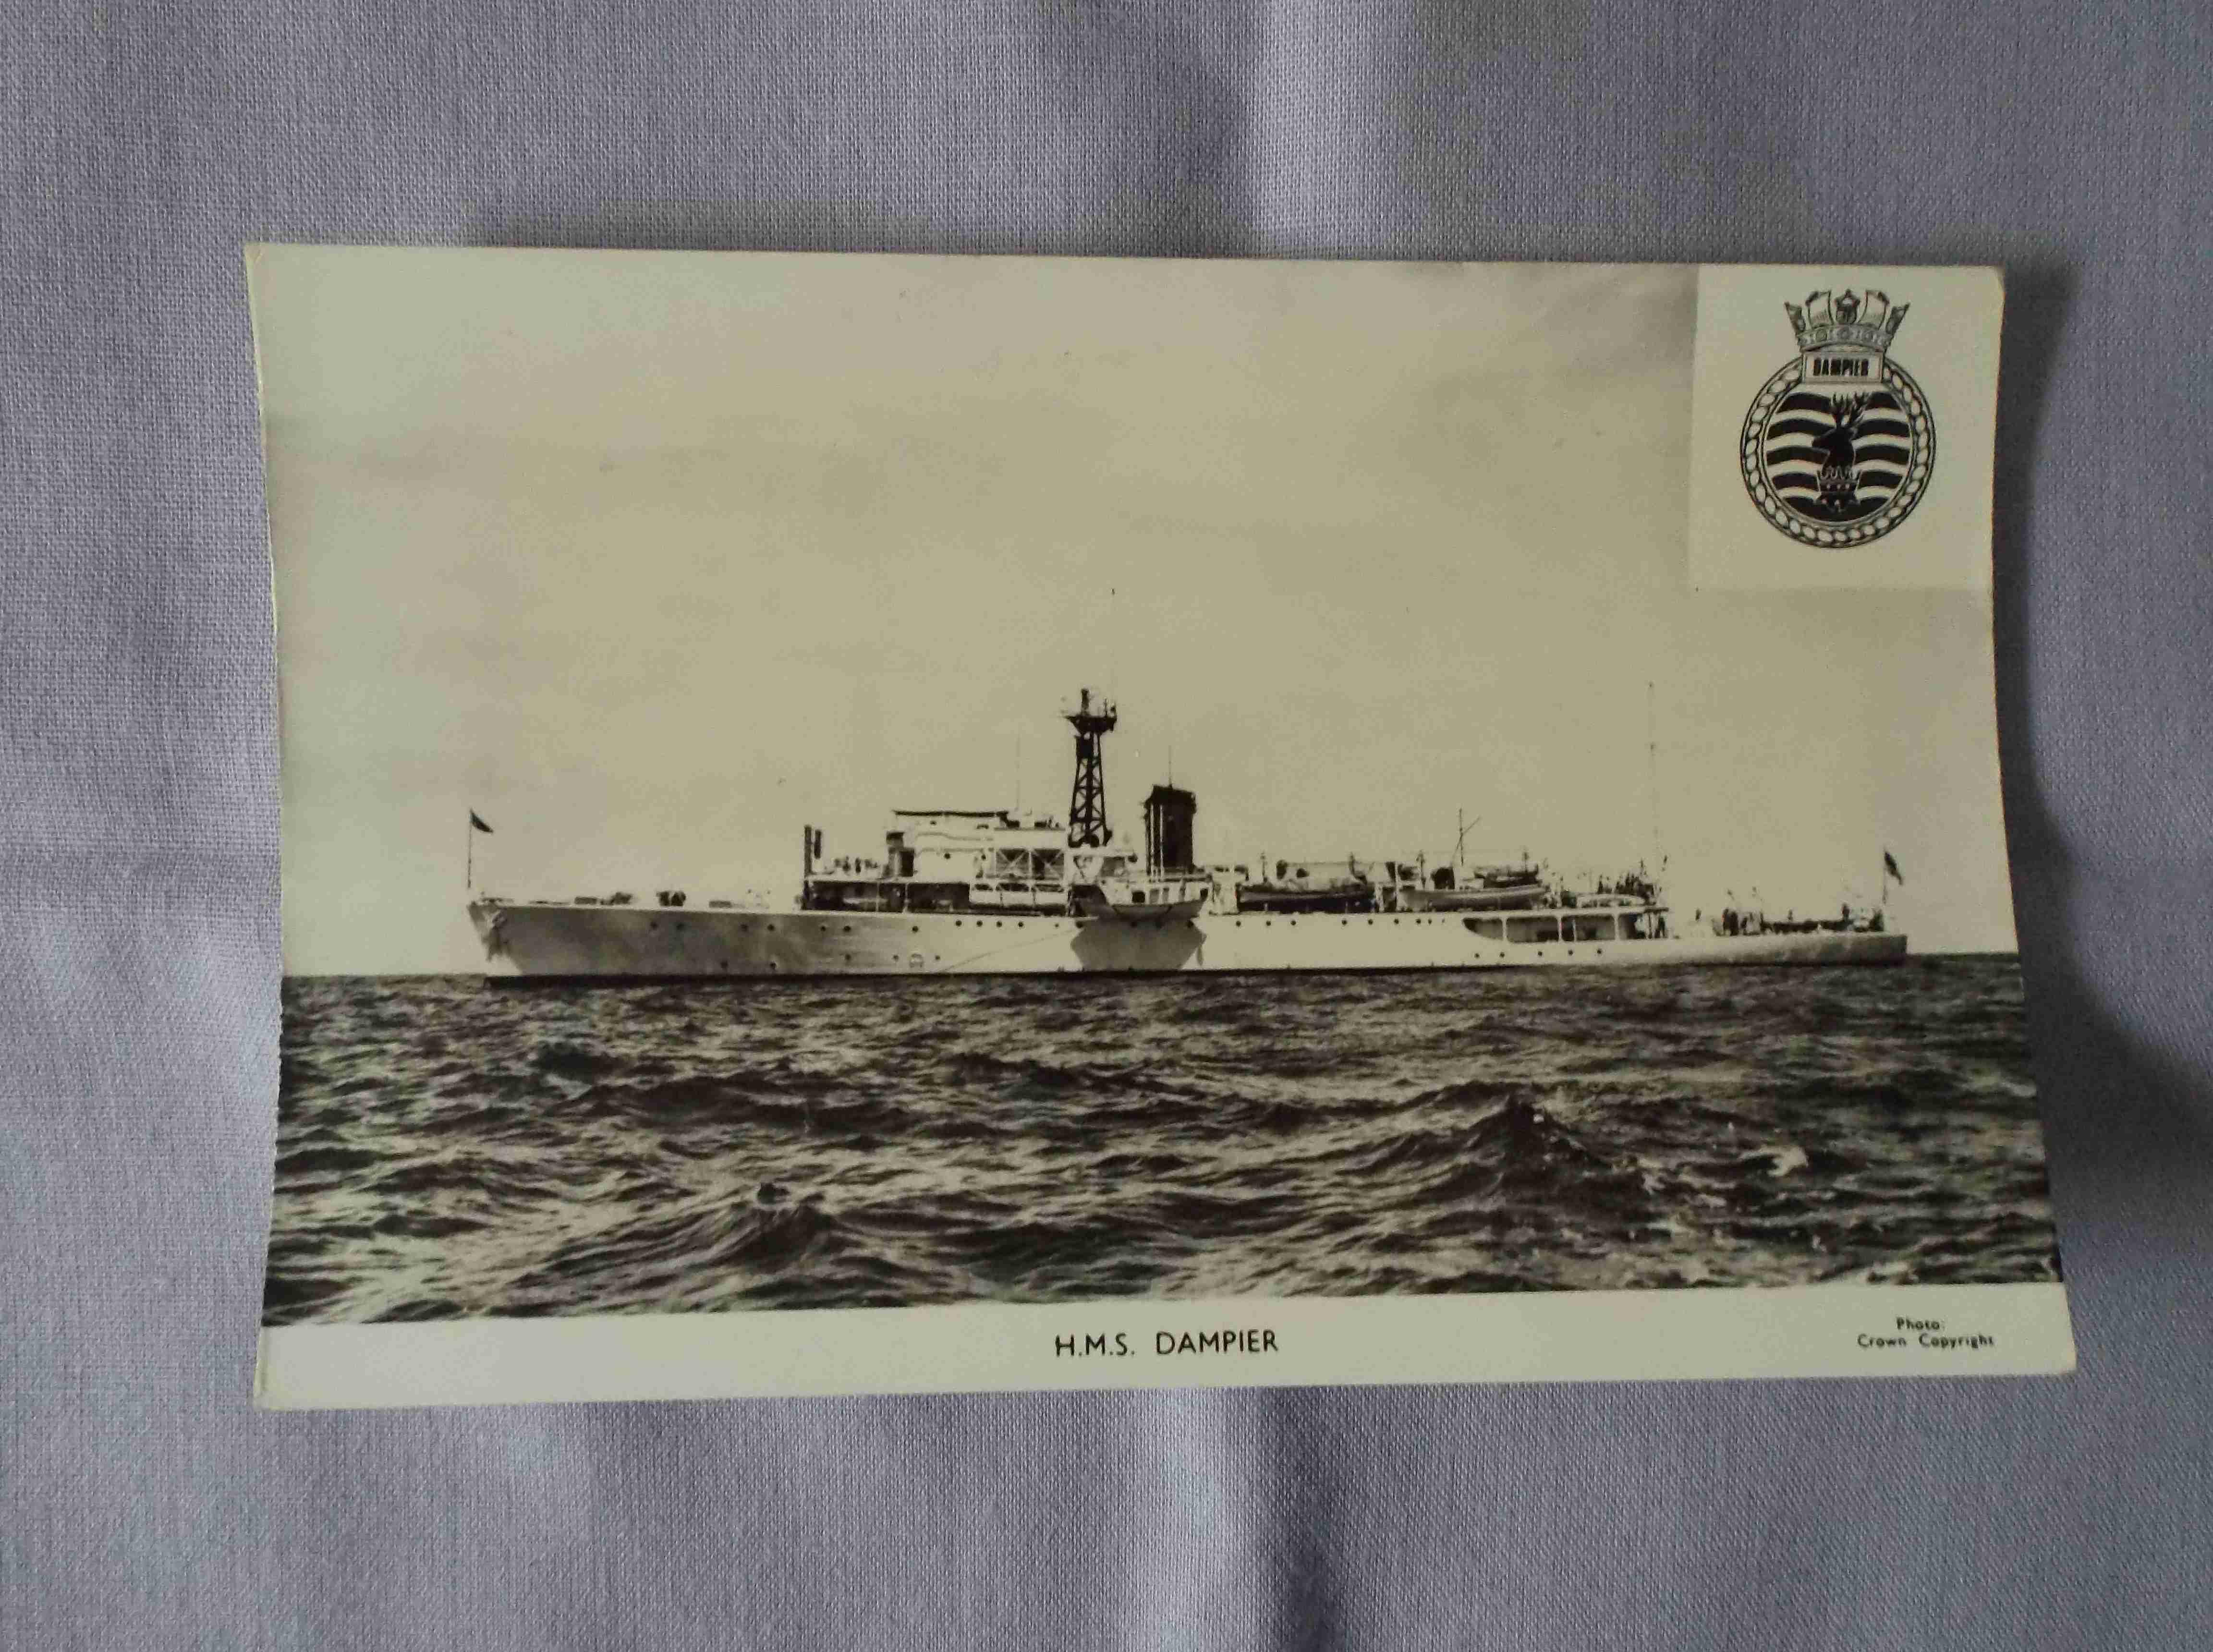 POSTCARD OF THE ROYAL NAVAL VESSEL HMS DAMPIER